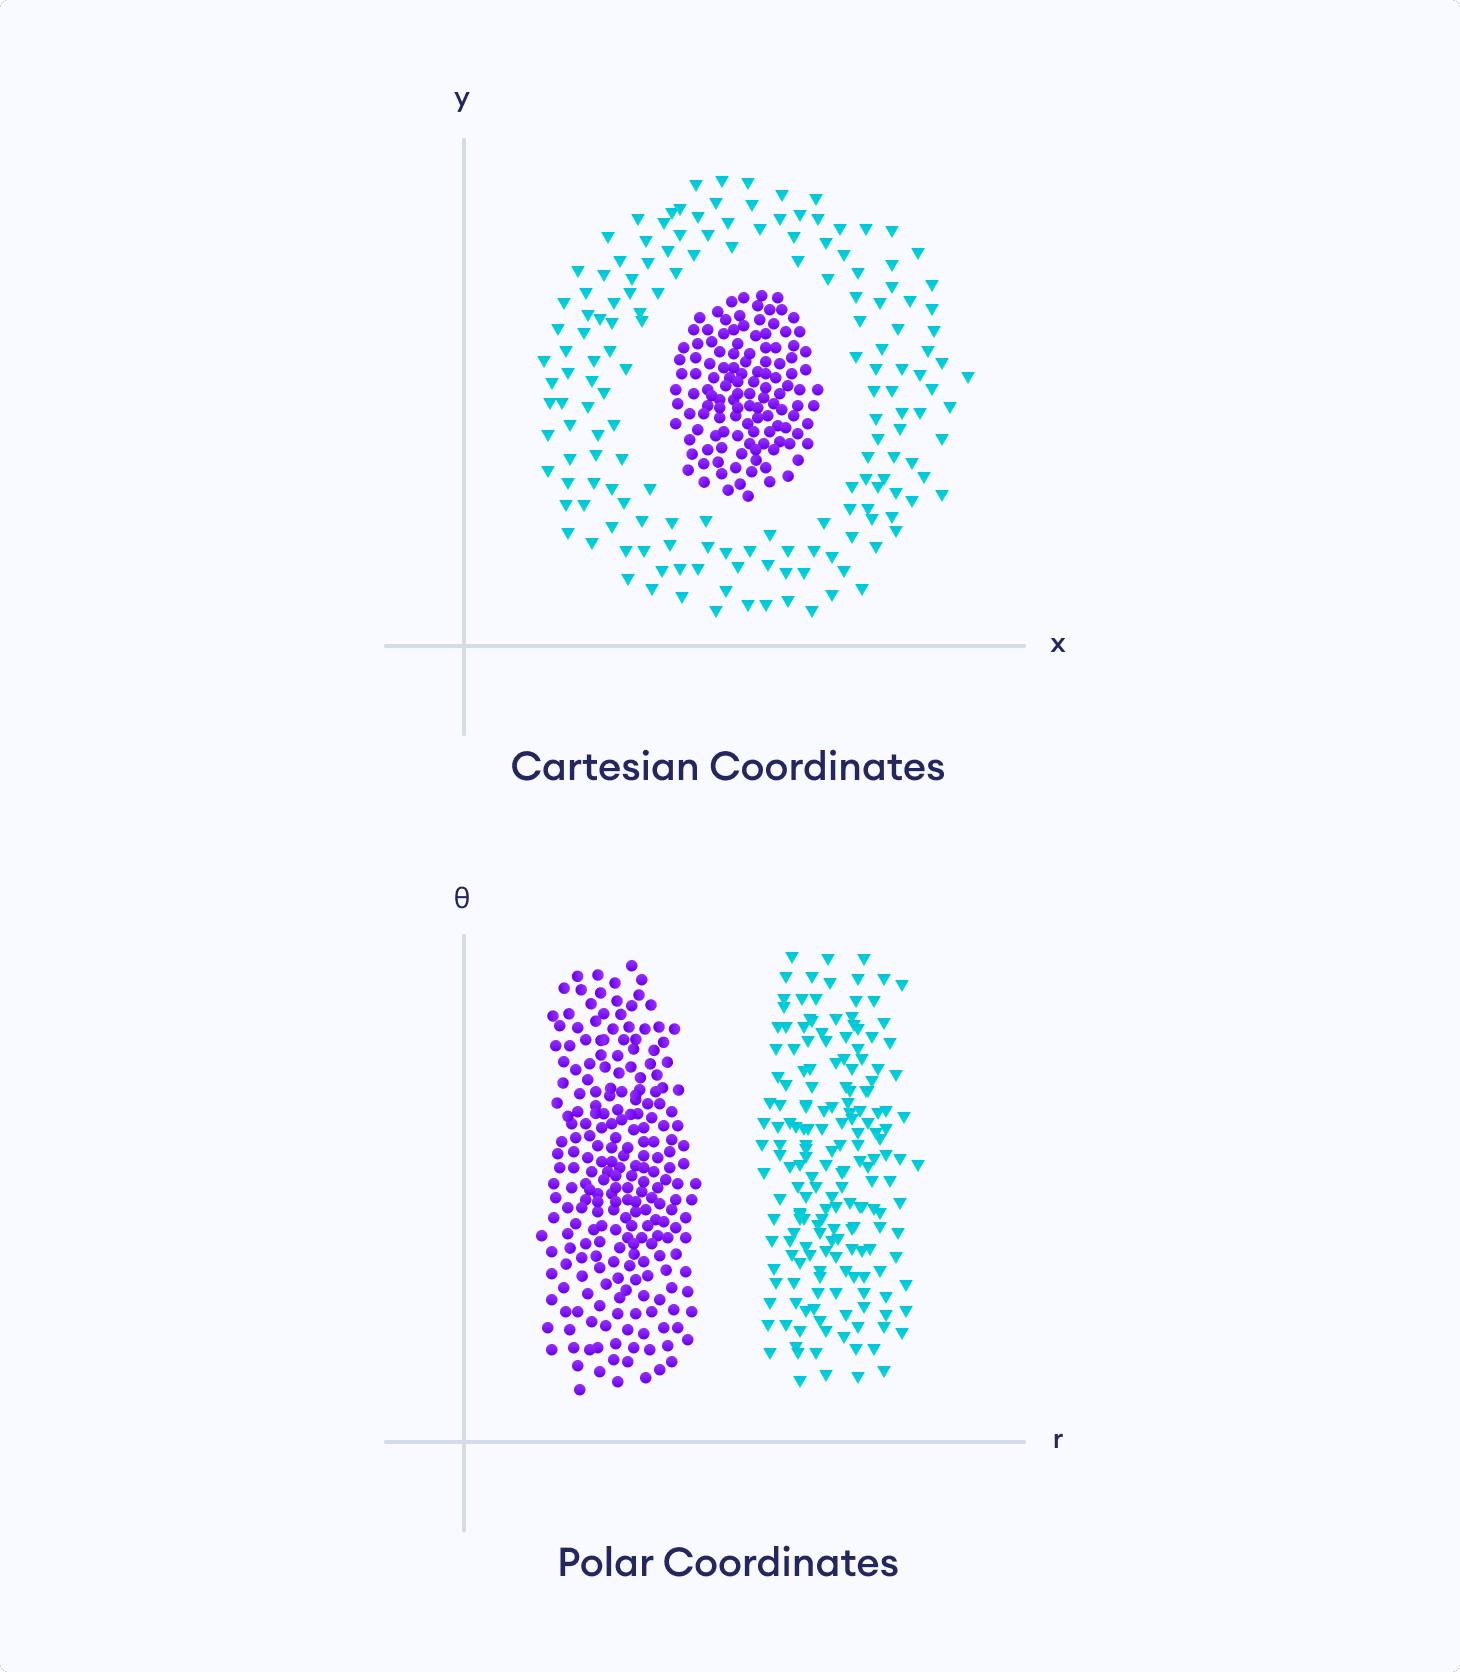 Representation of data in Cartesian vs Polar coordinates